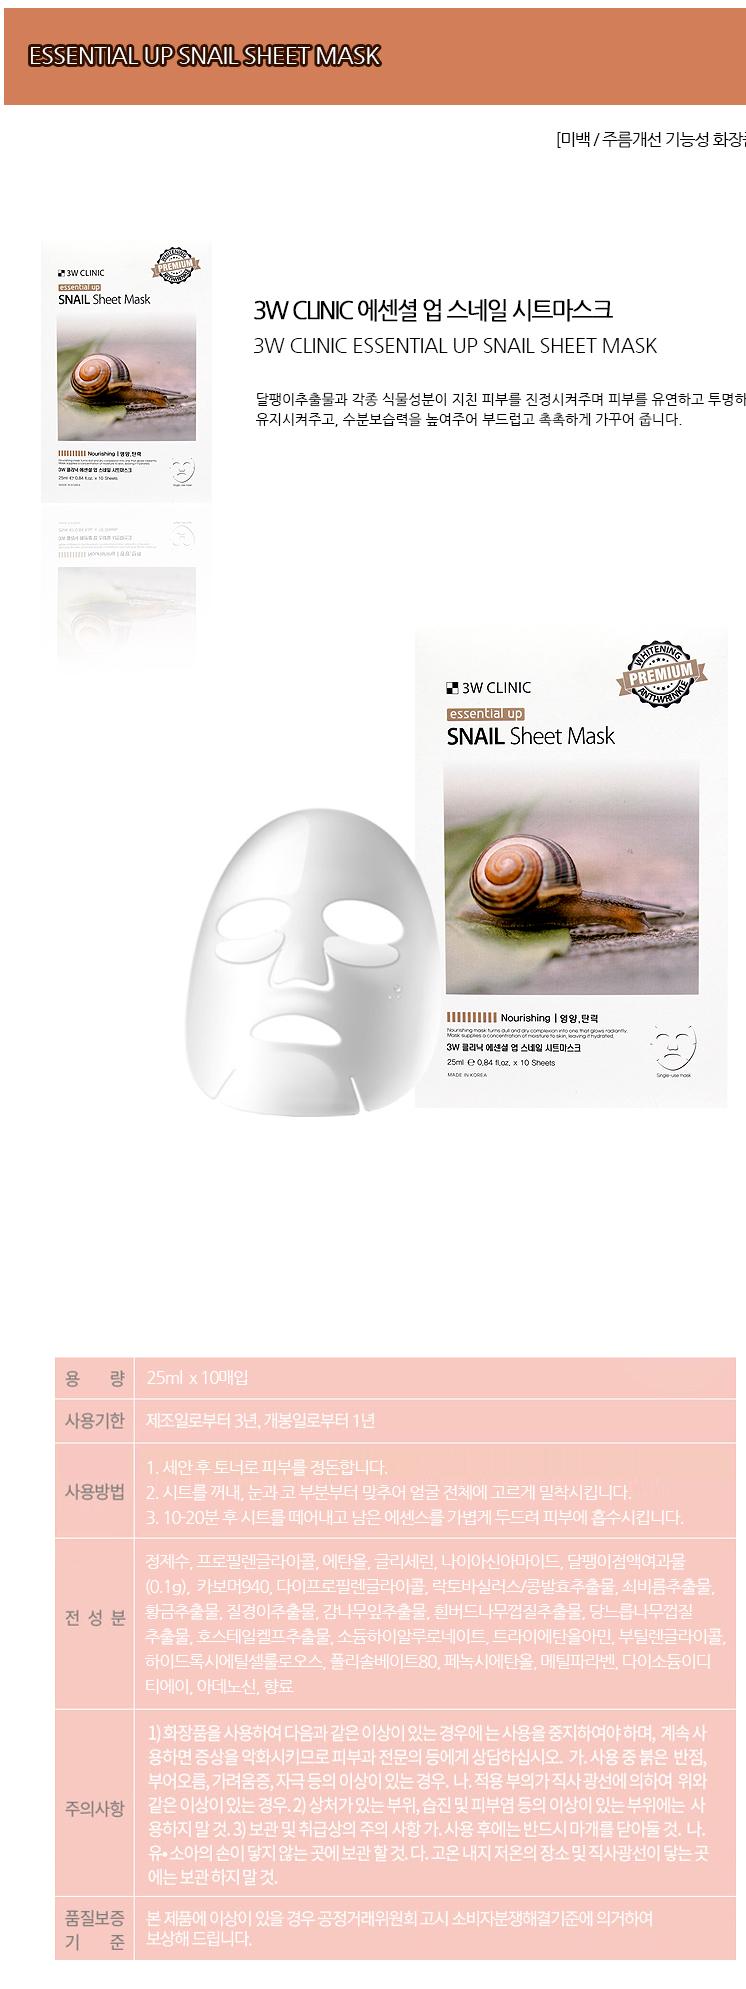 3W-CLINIC-Essential-Up-Snail-Sheet-Mask-10ea.jpg